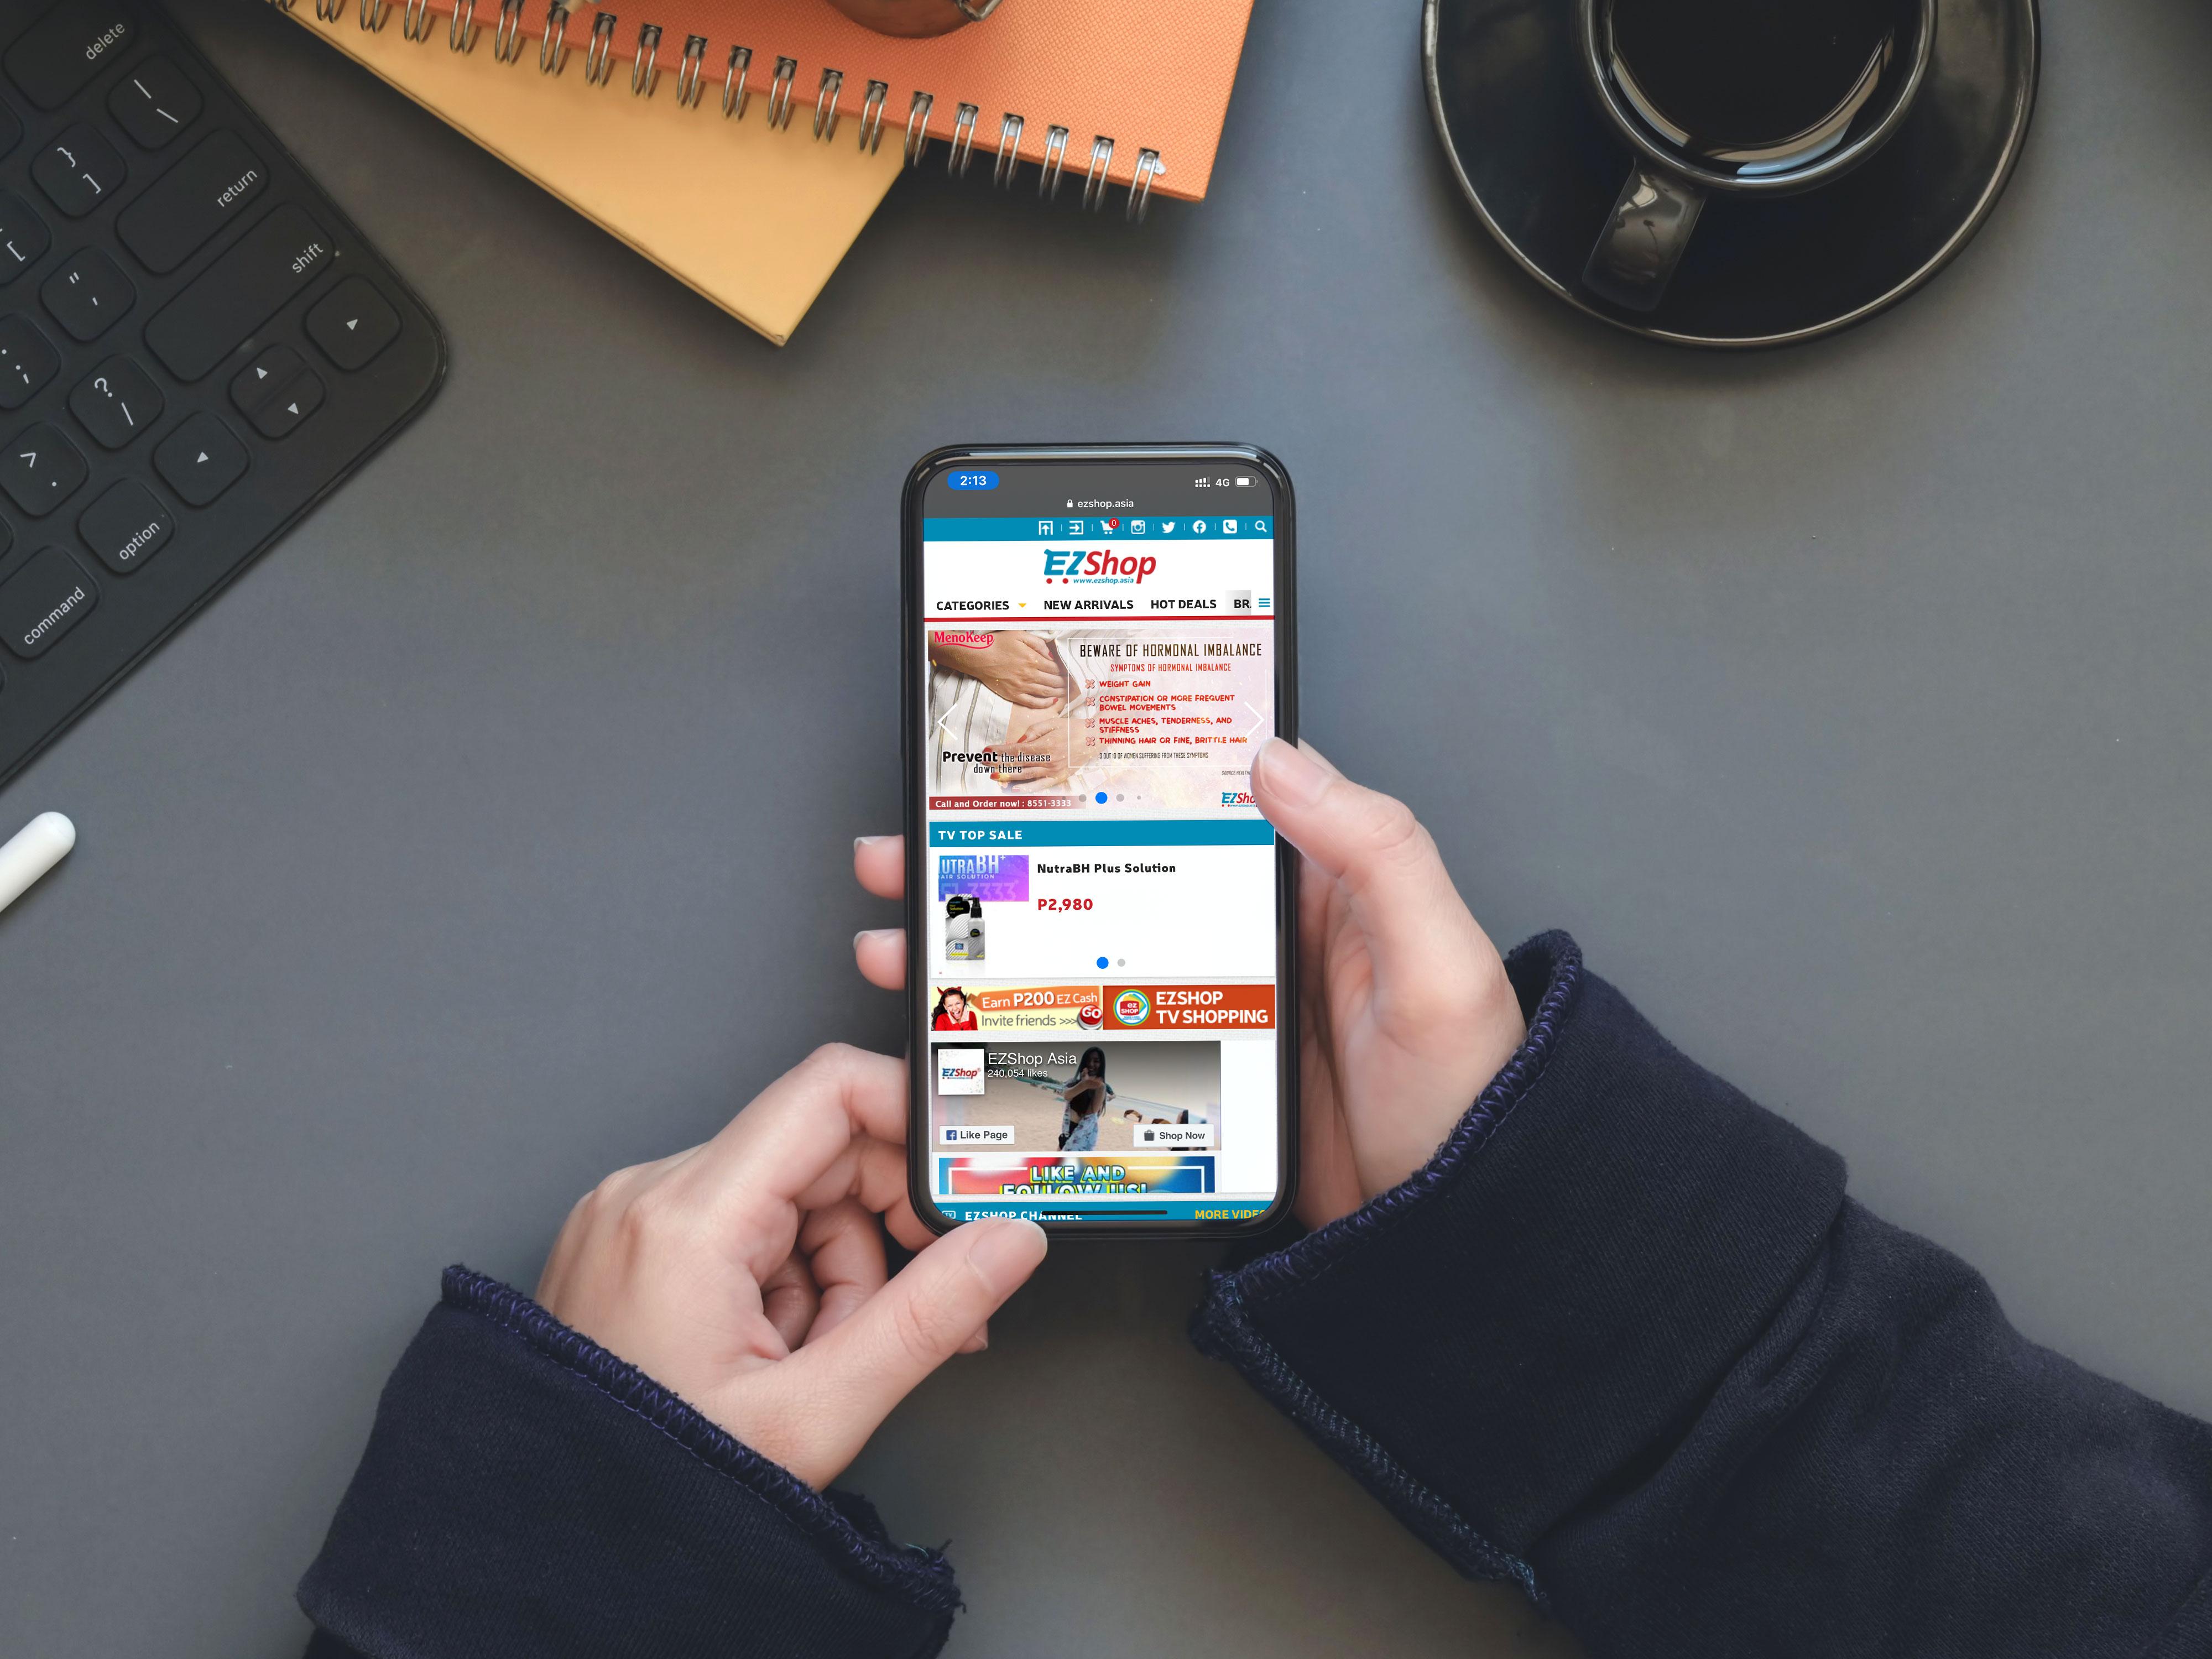 EZShop, Online shopping, Philippines, 線上購物, 電視購物, 菲律賓, 品牌設計, 標誌設計, sam brandesign